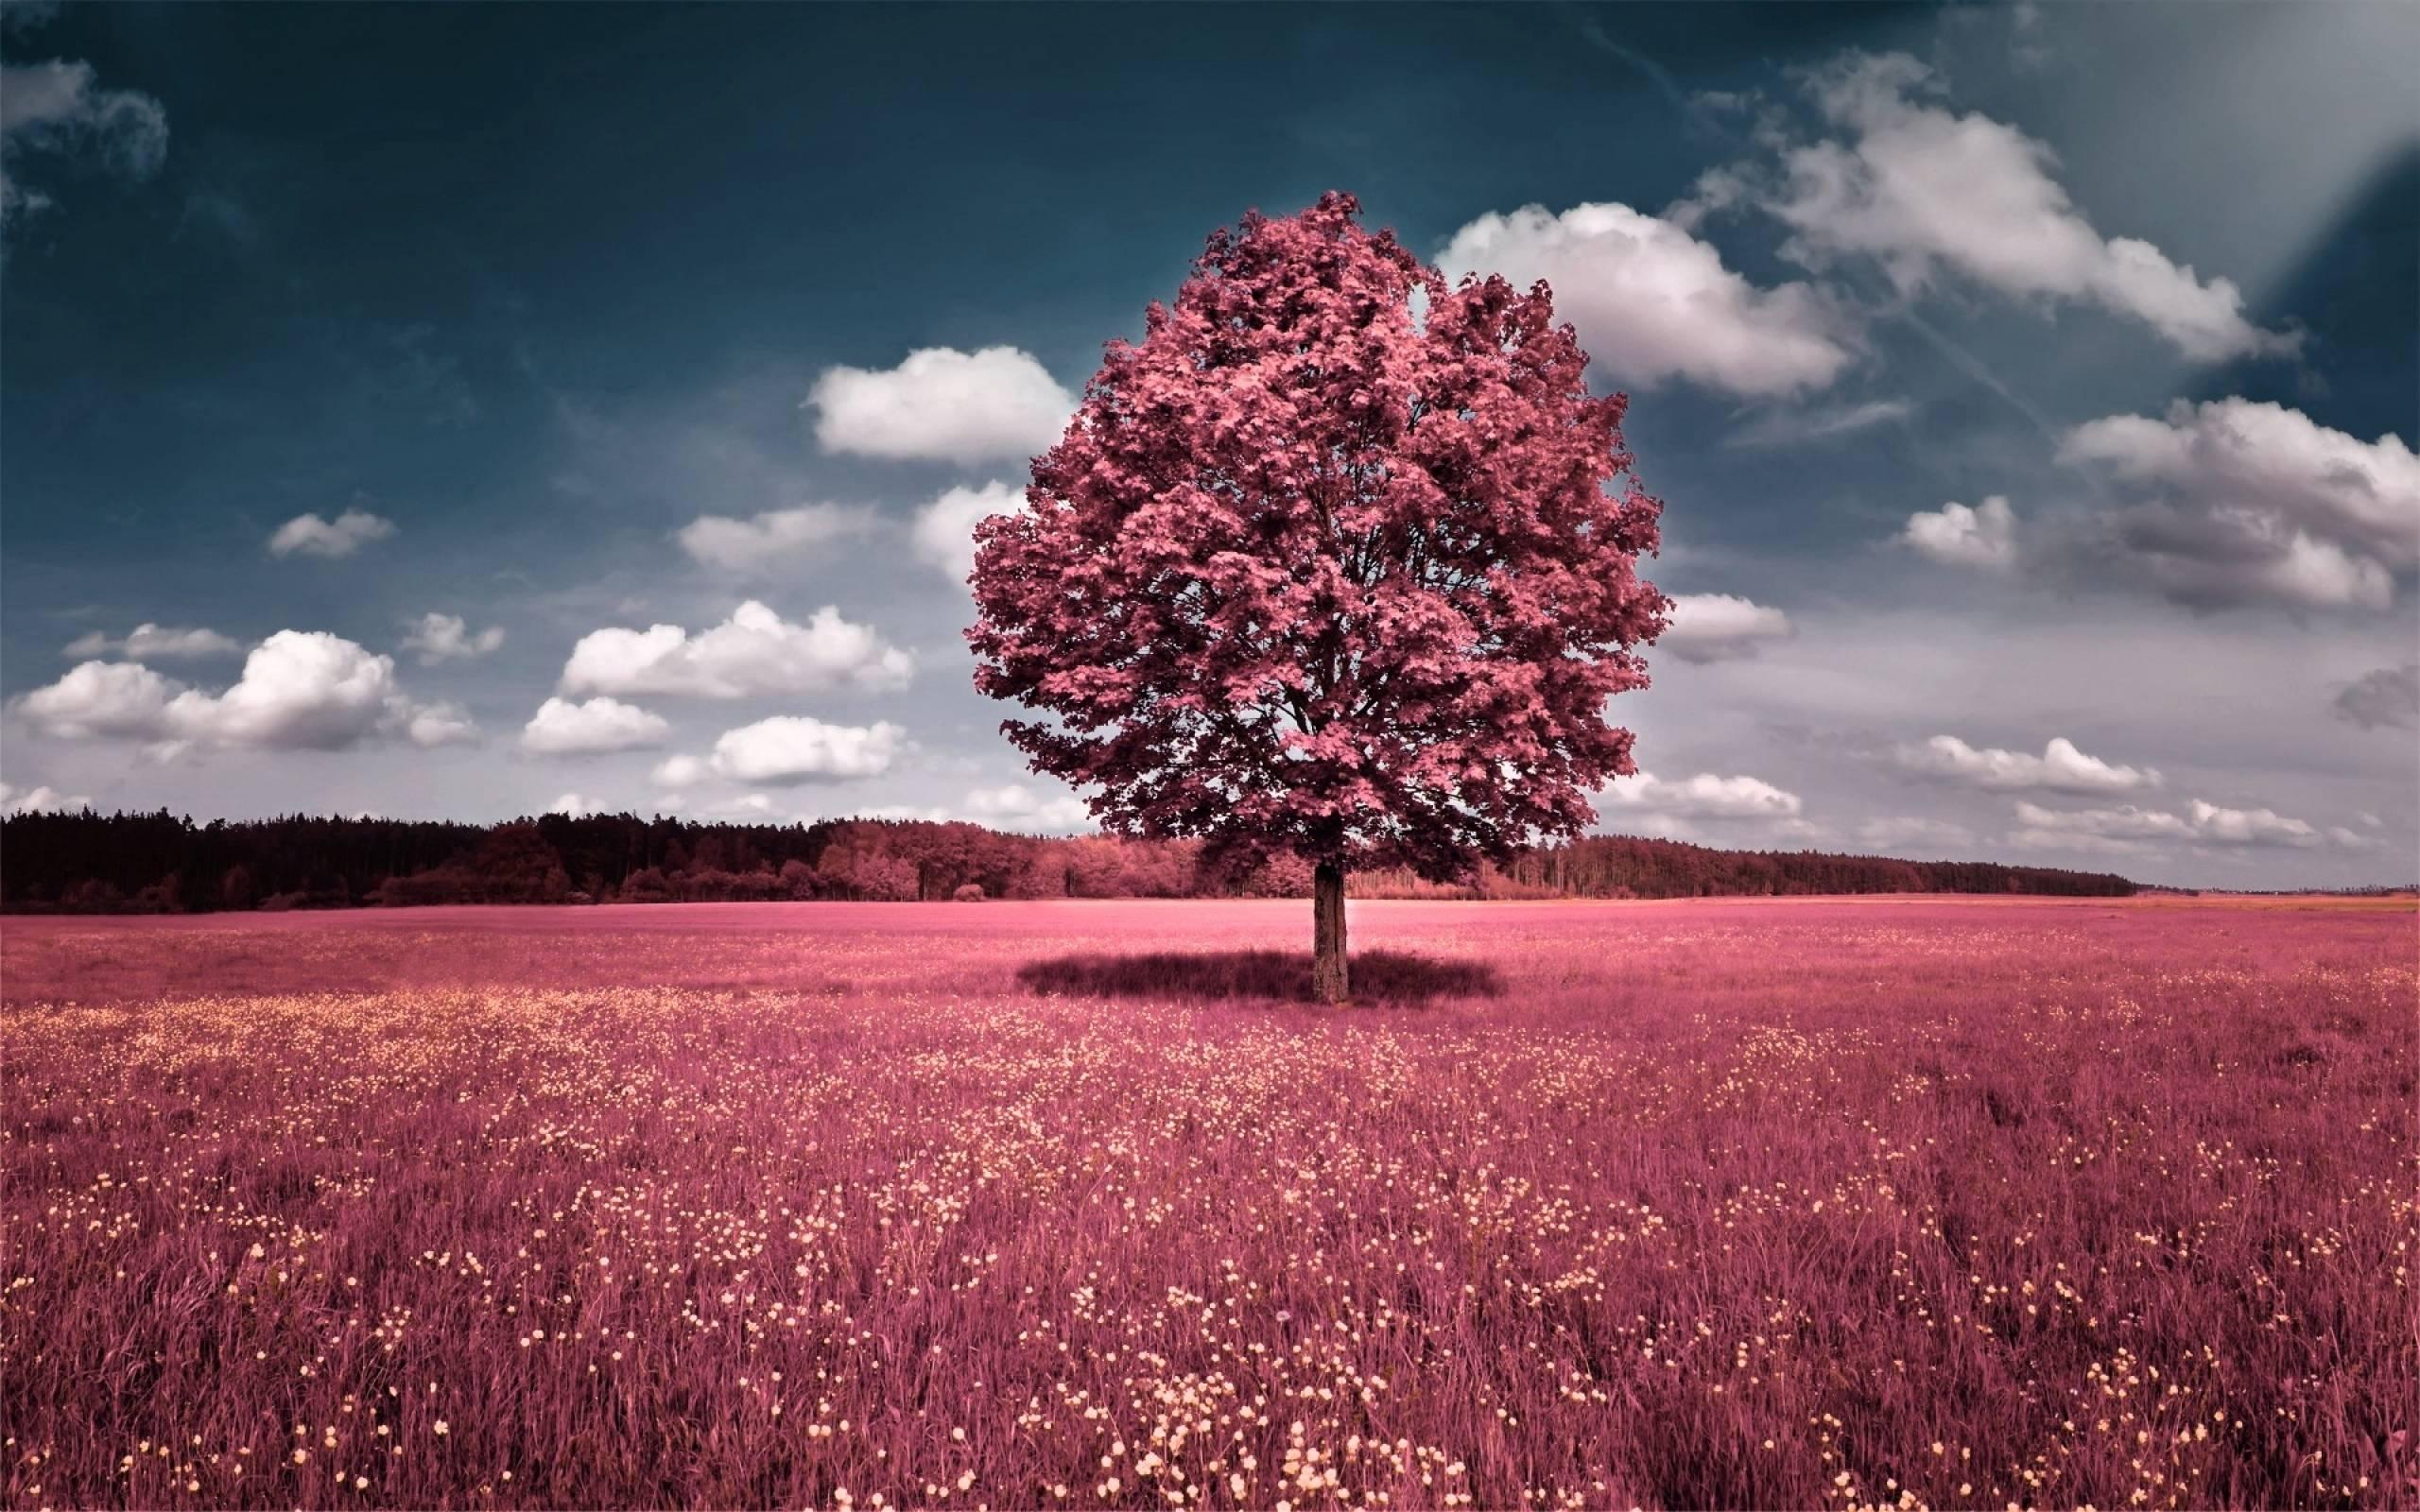 Pink Tree Nature Scenery Wallpaper HD #8729 #3044 Wallpaper | SpotIMG